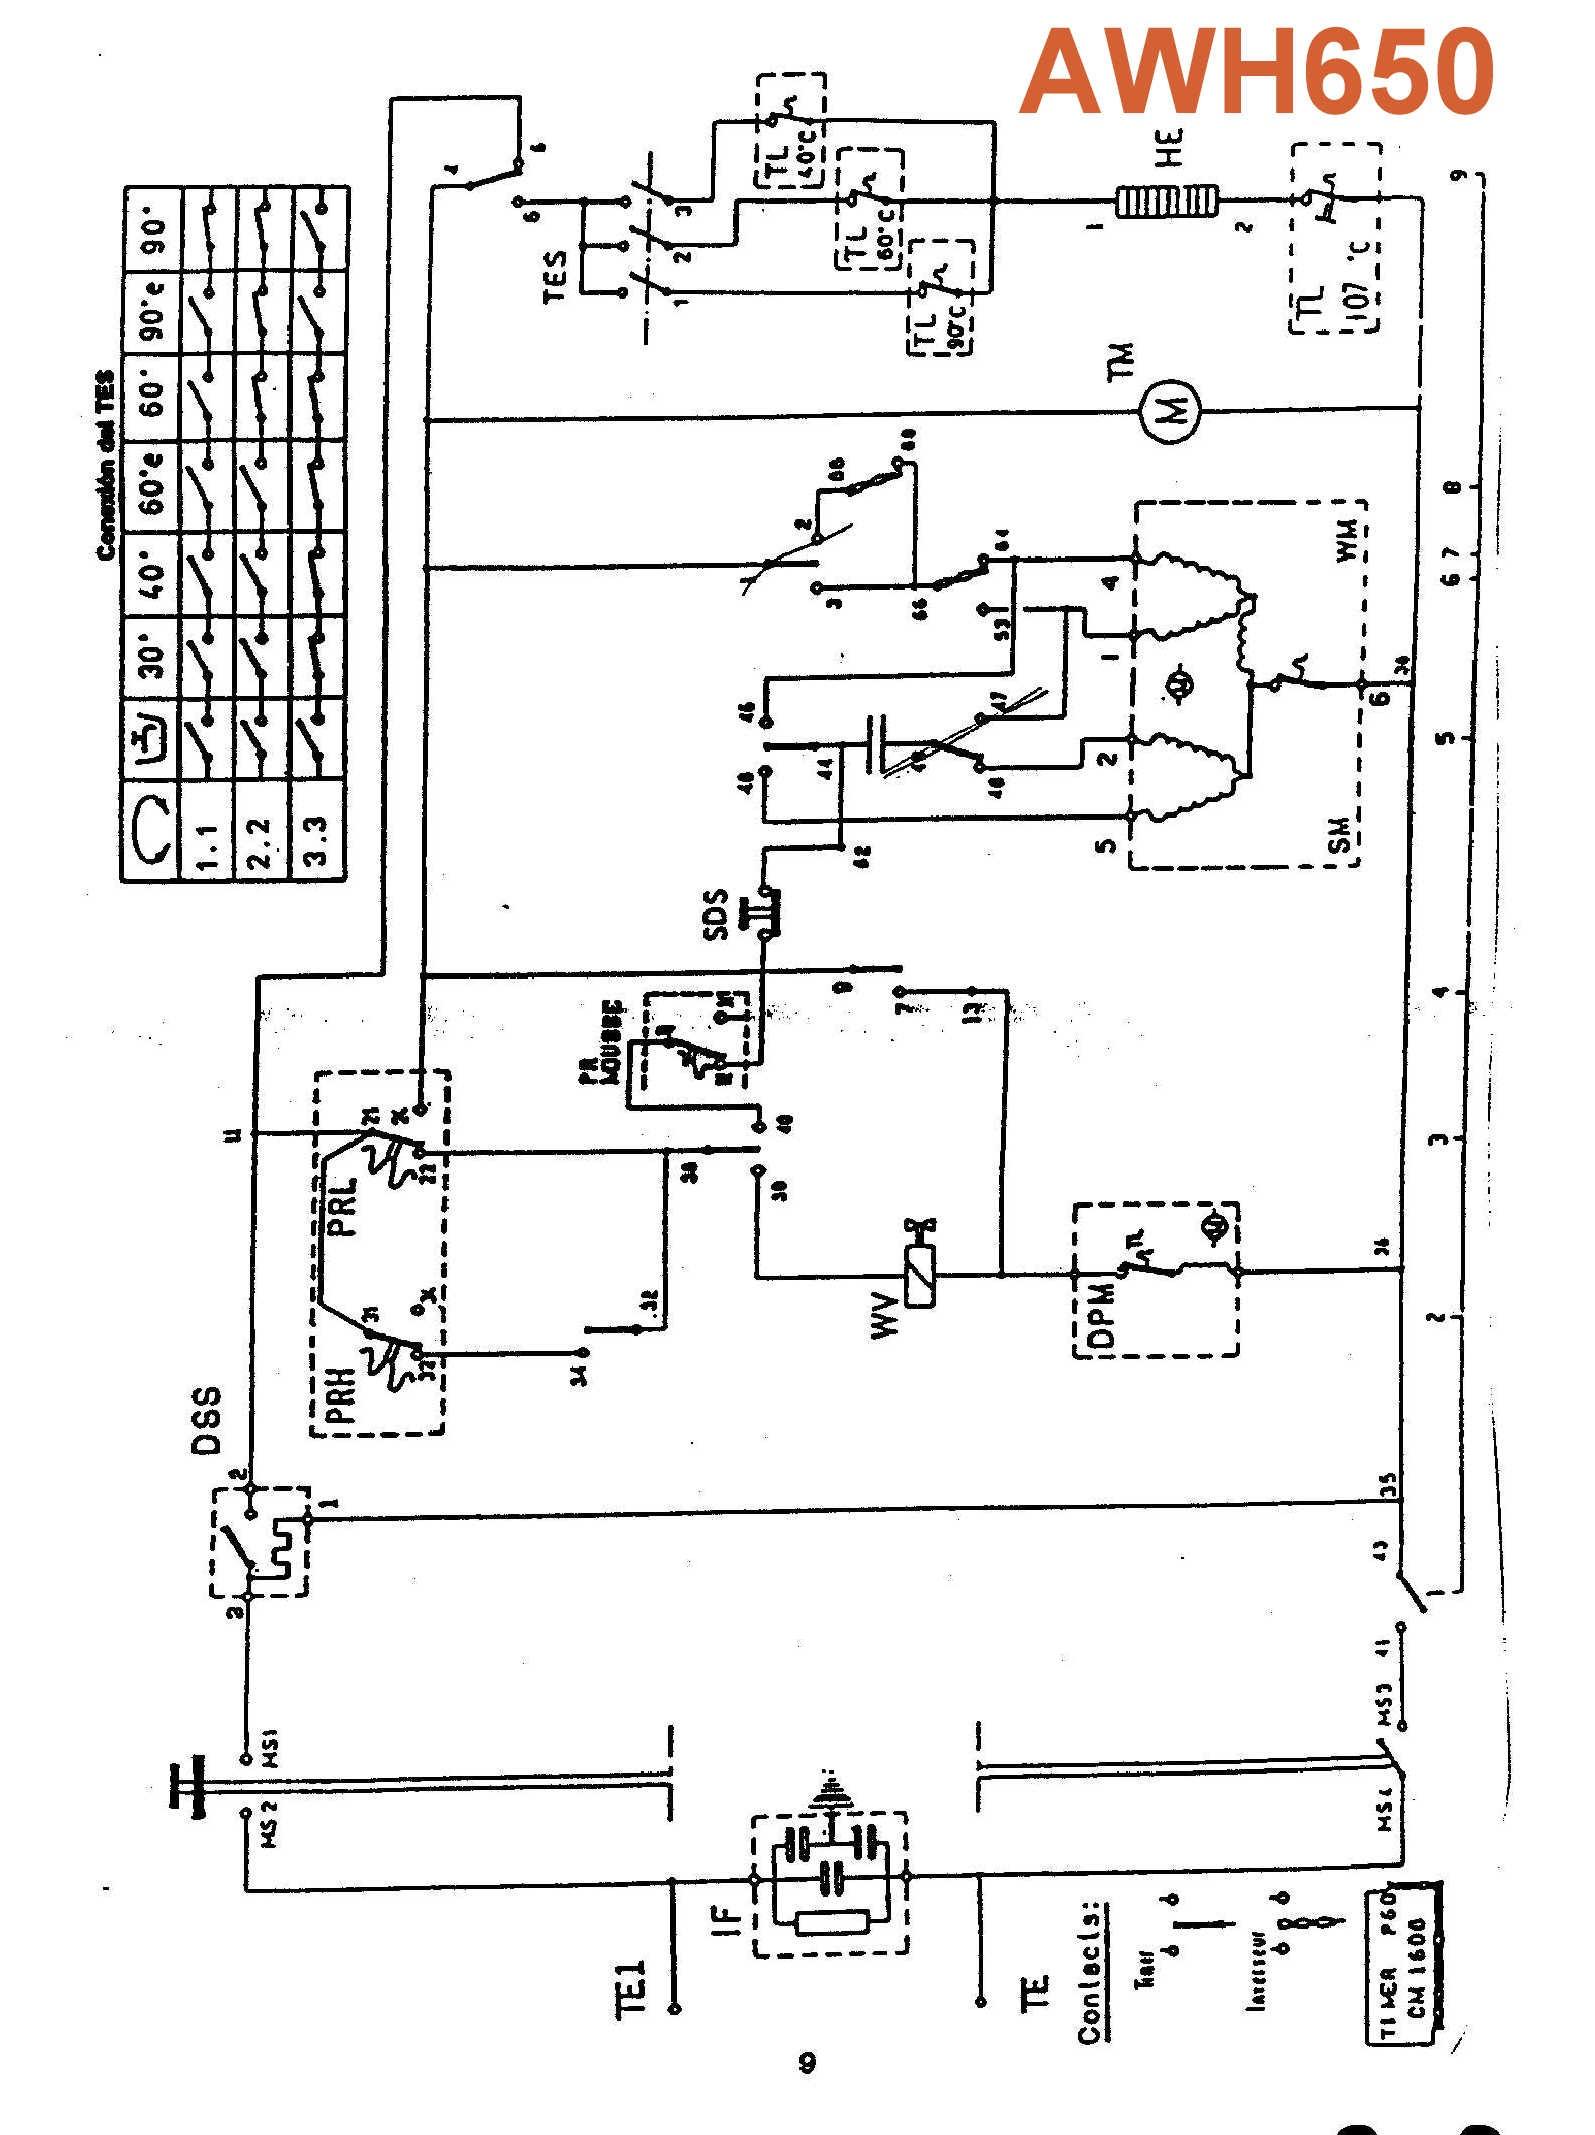 circuito el u00e9ctrico lavarropas eslab u00f3n de lujo awh650